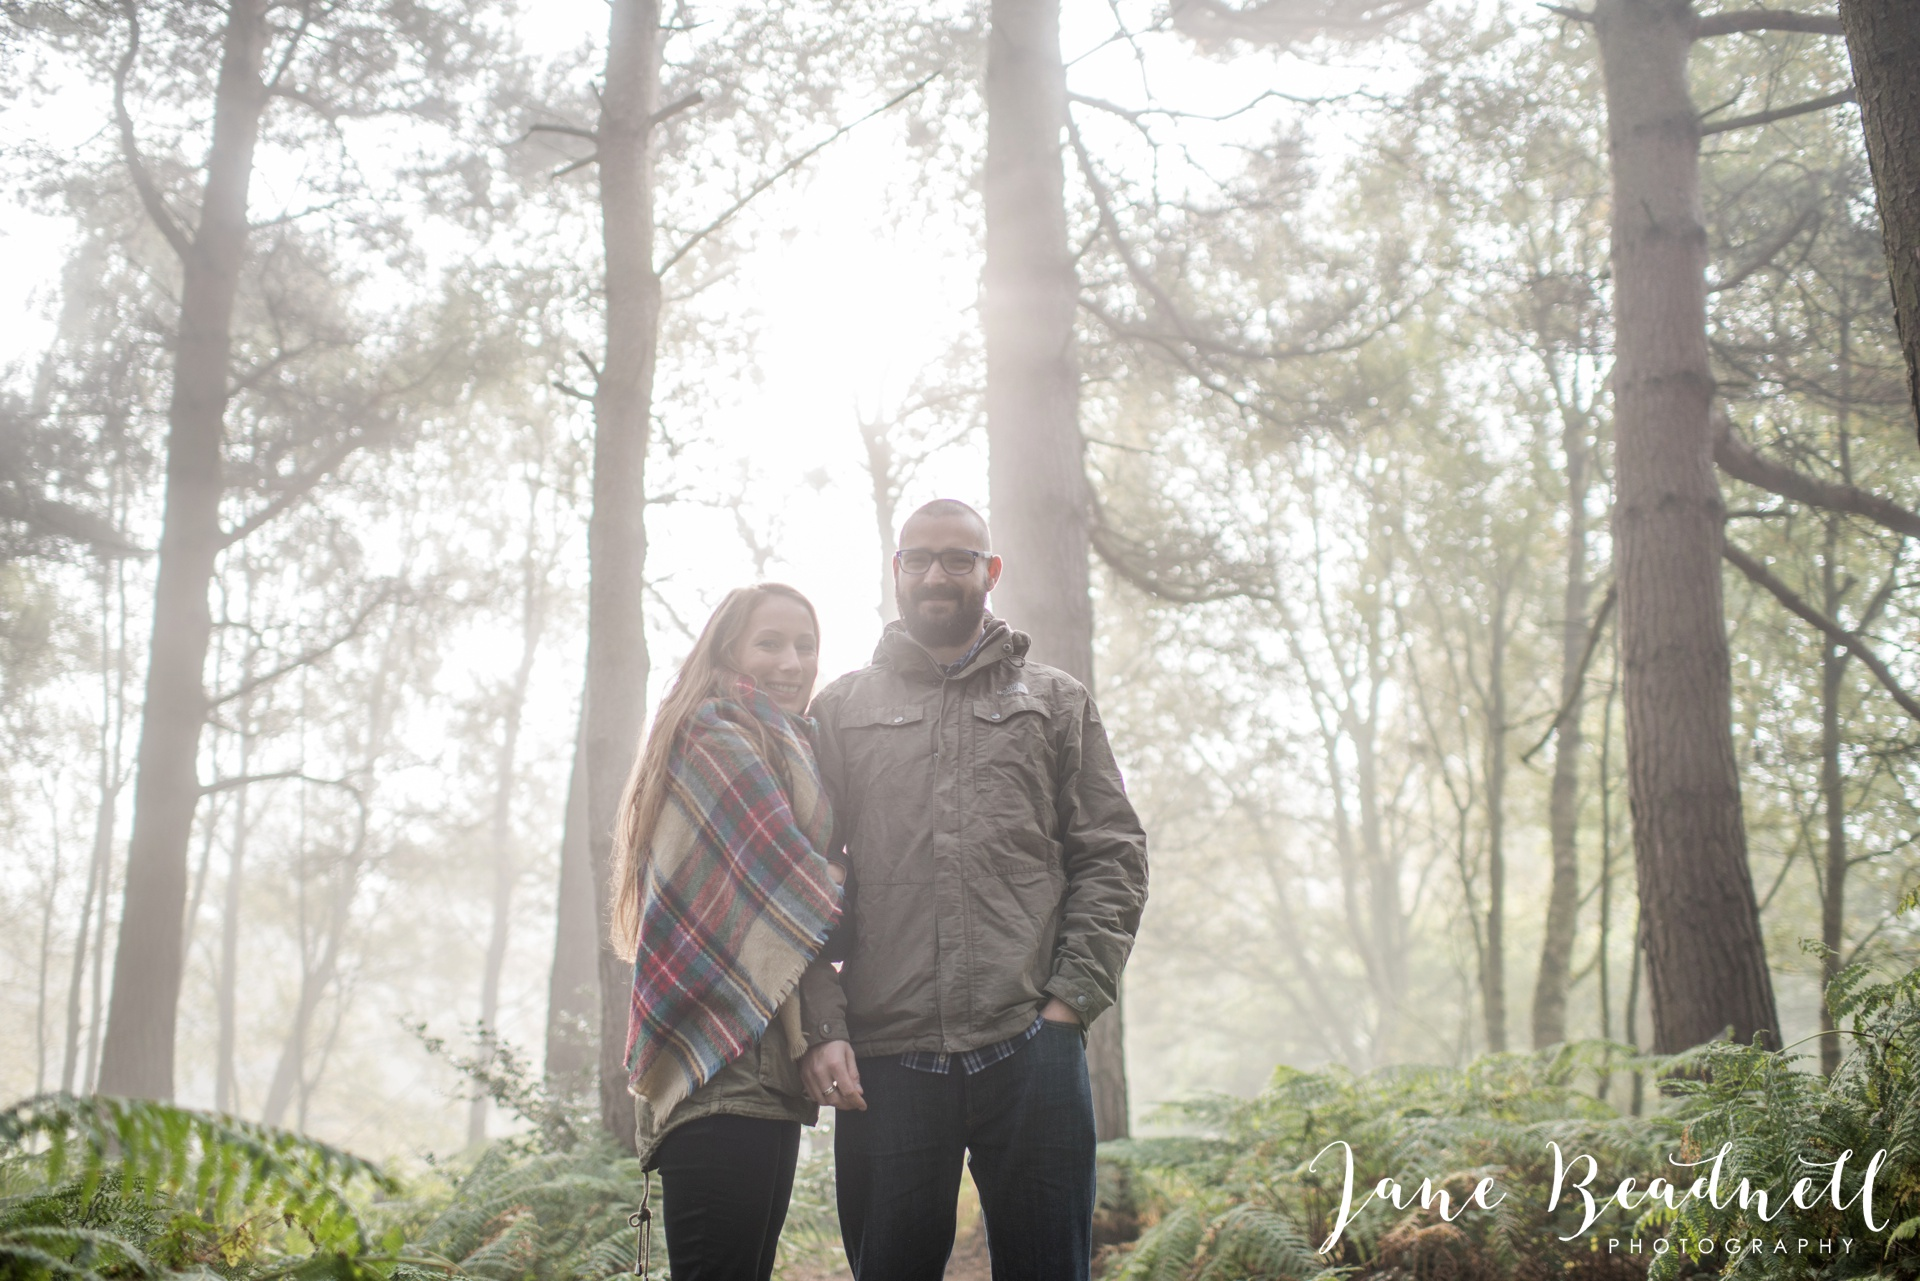 Jane Beadnell fine art wedding photographer engagement photography Otley_0006